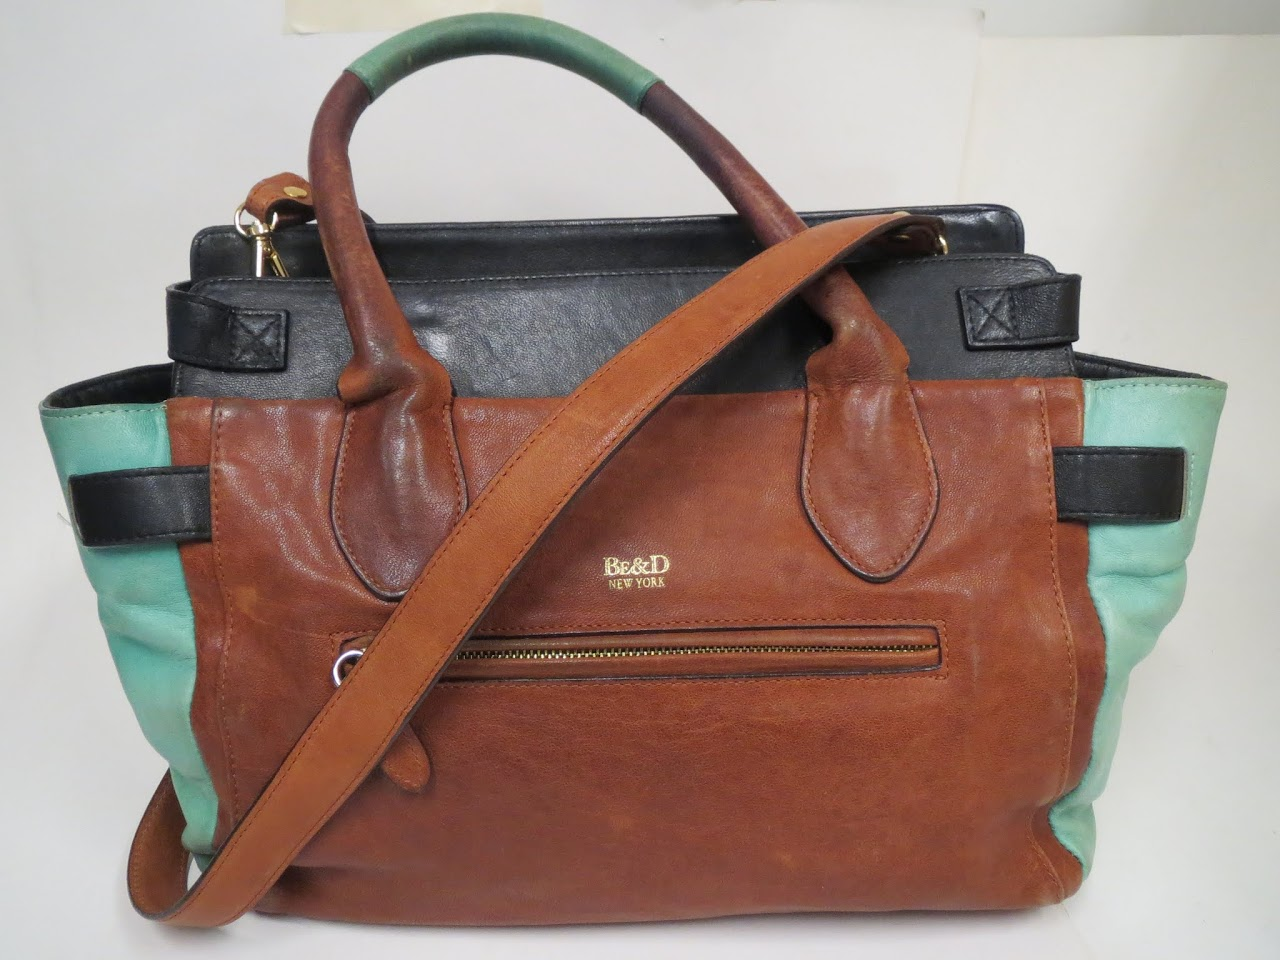 Be & D Colorblock Shoulder Bag